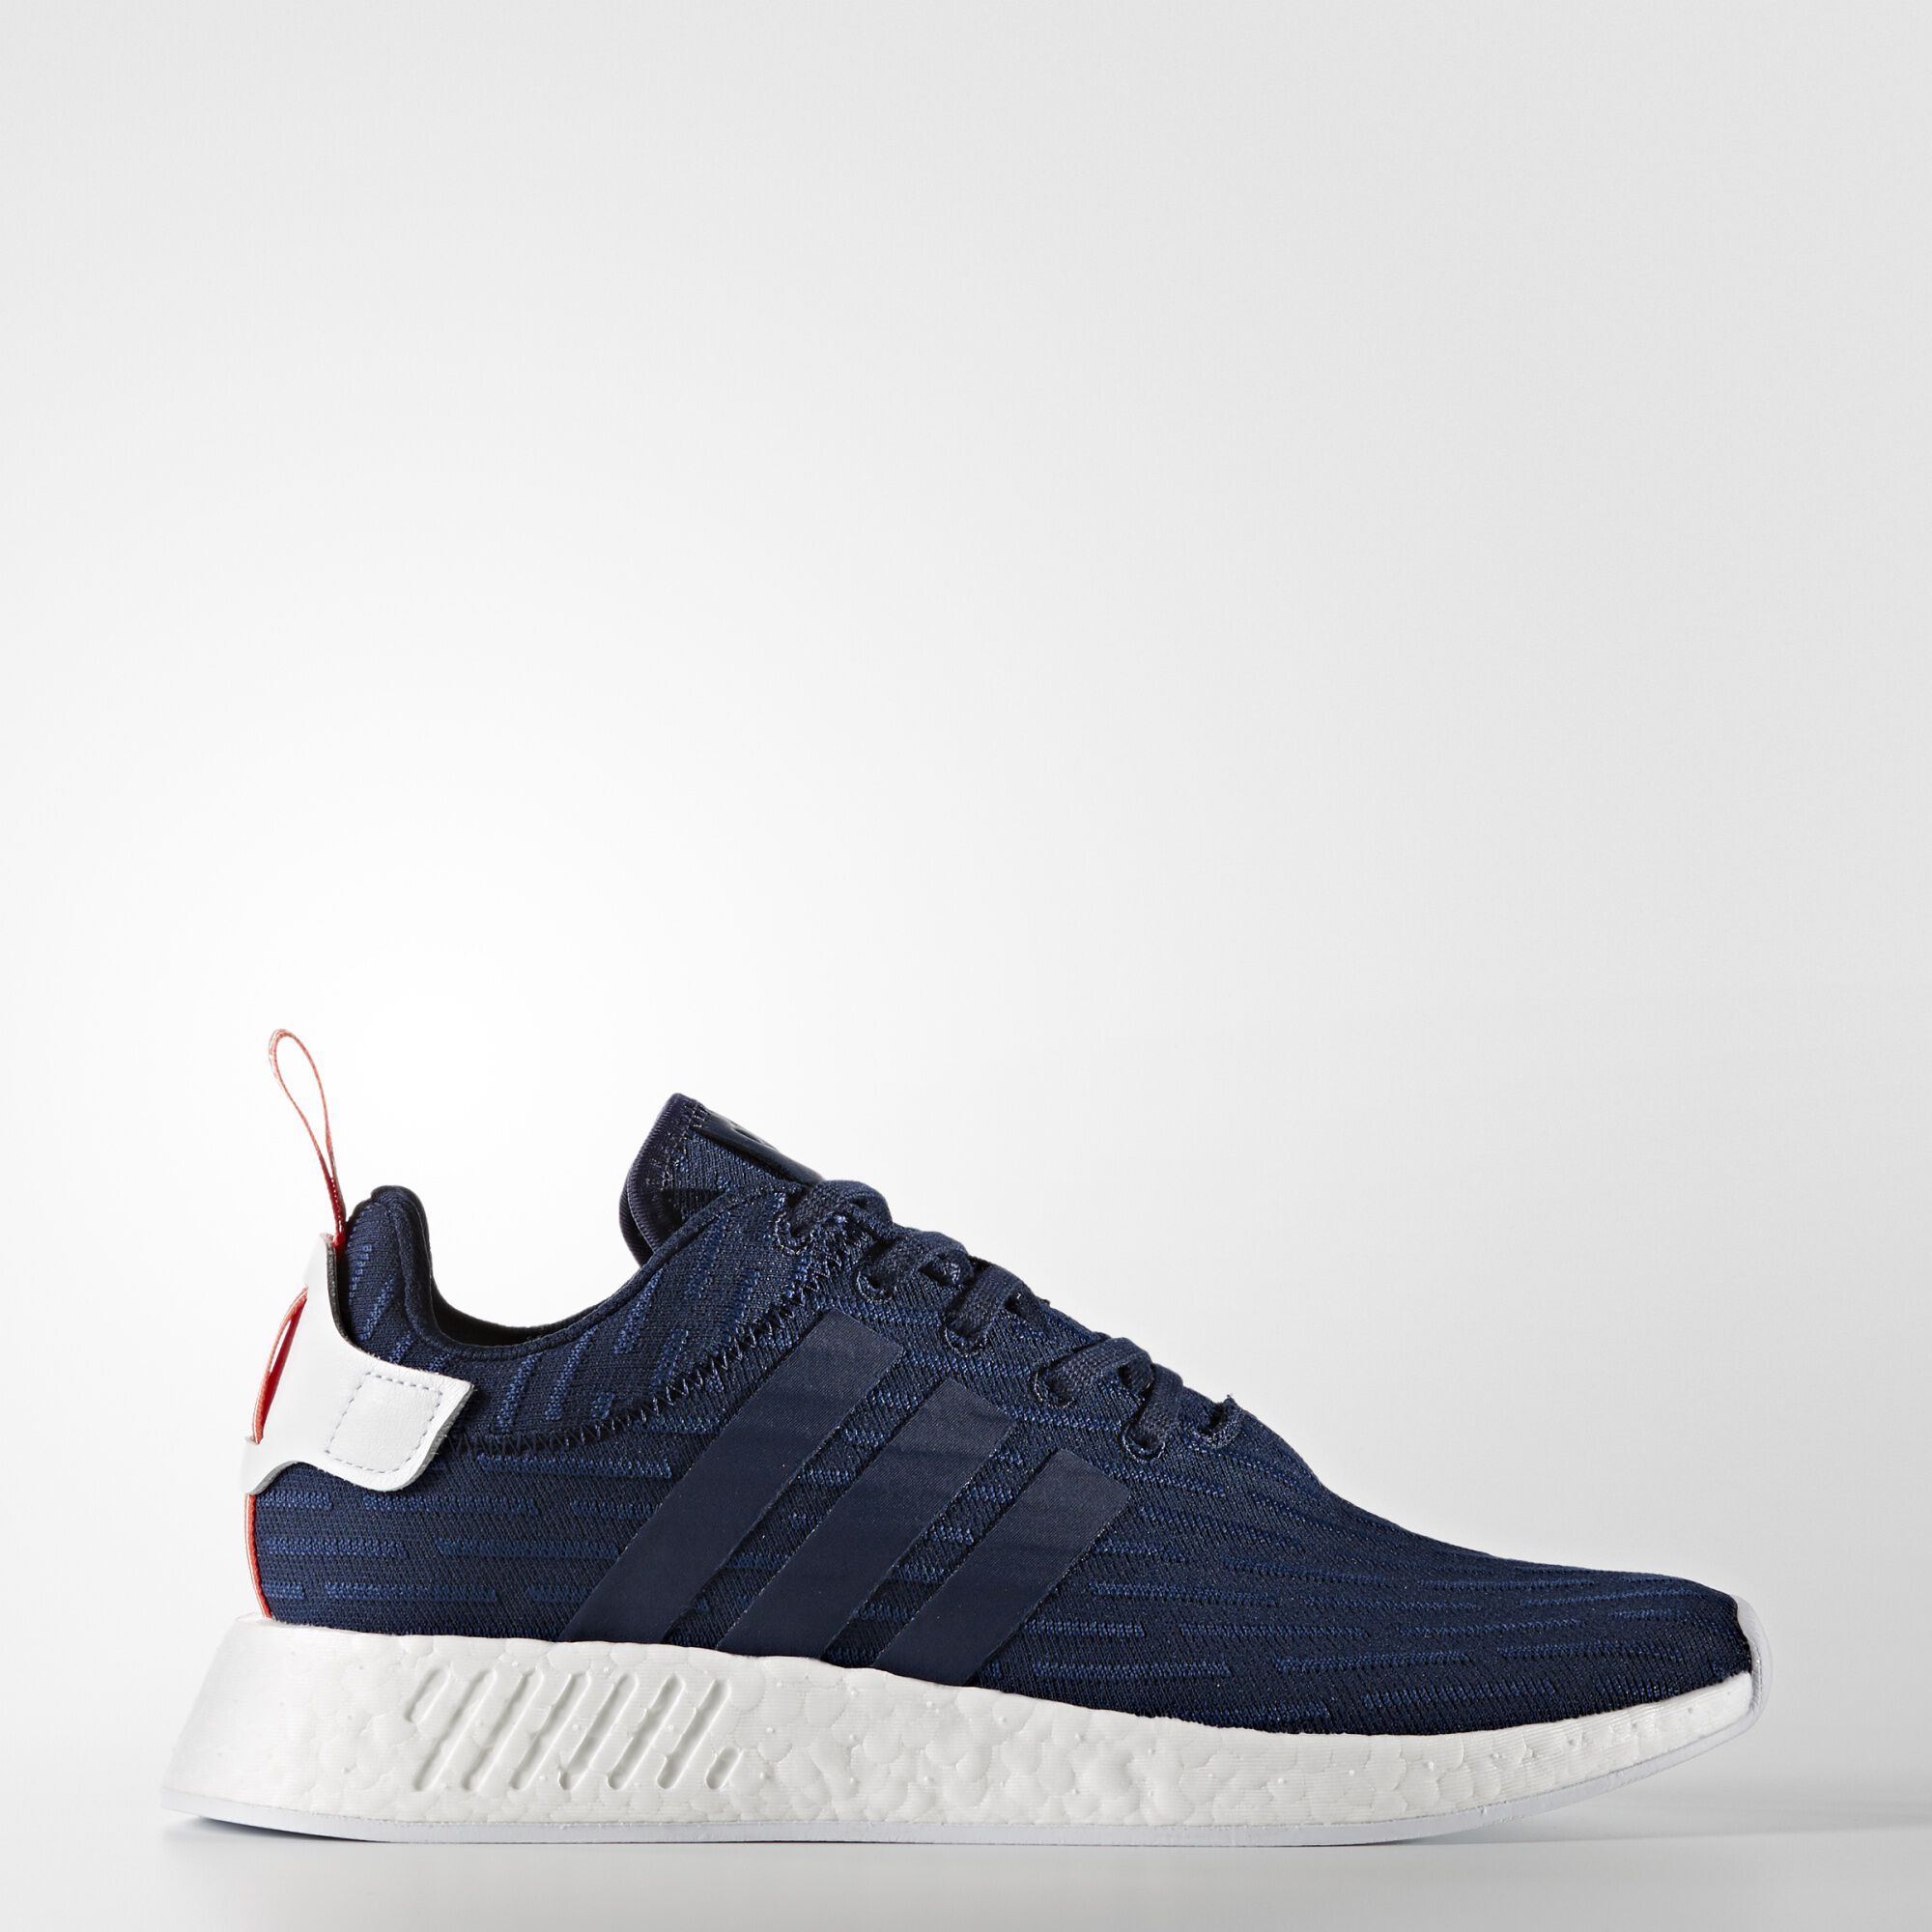 Adidas Nmd Mens R1